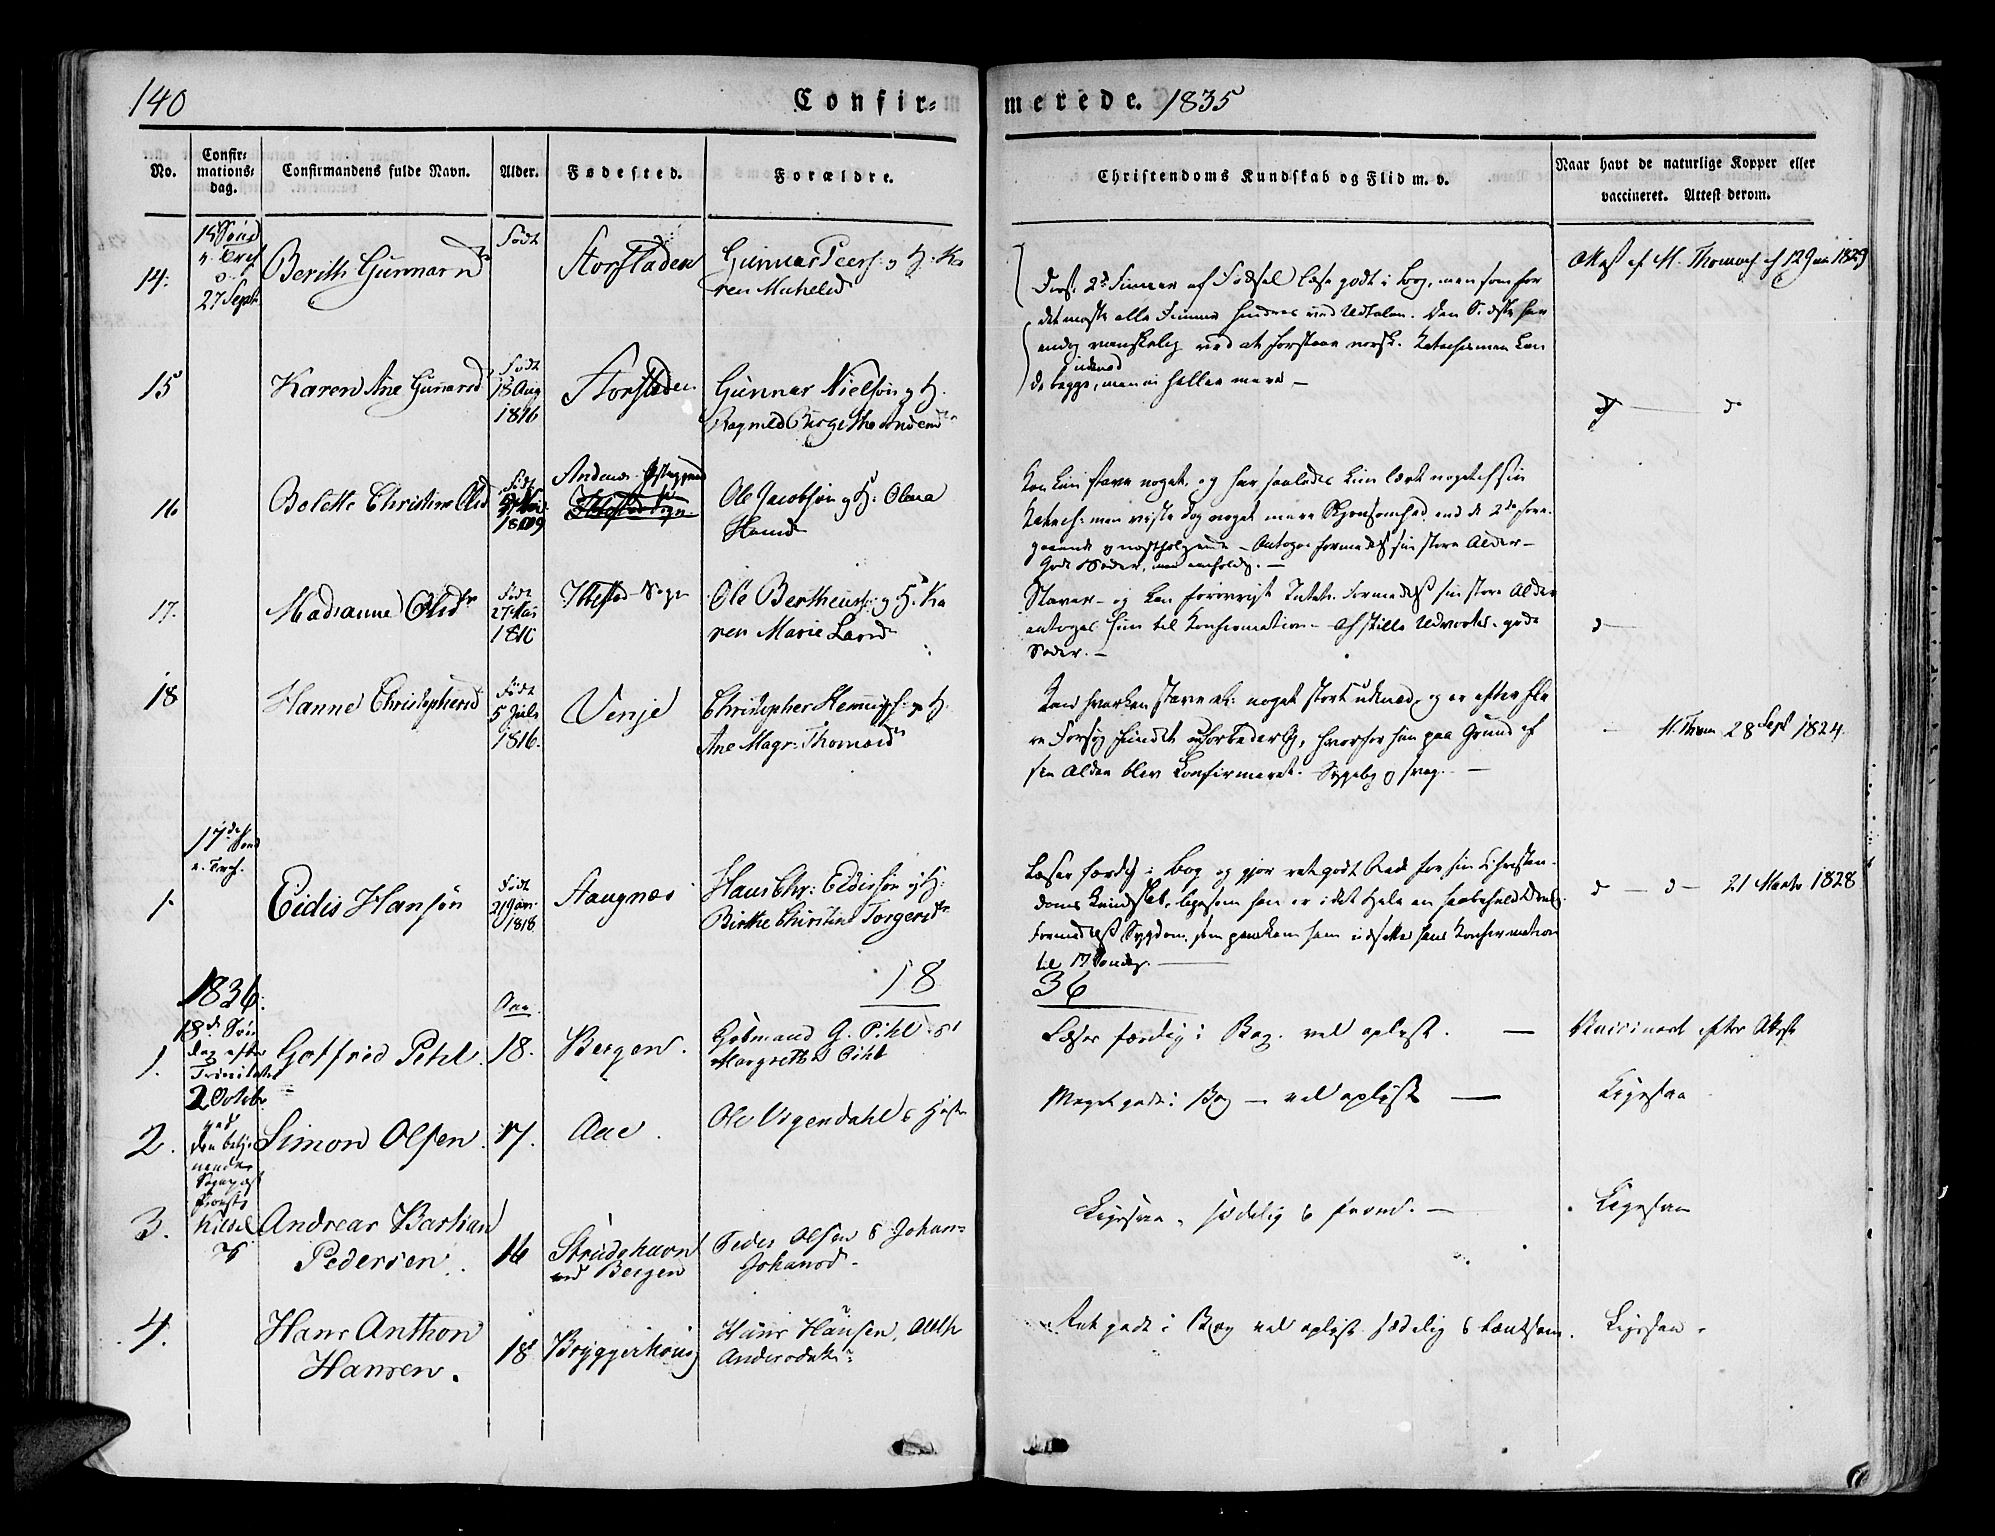 SATØ, Tranøy sokneprestkontor, I/Ia/Iaa/L0005kirke: Ministerialbok nr. 5, 1829-1844, s. 140